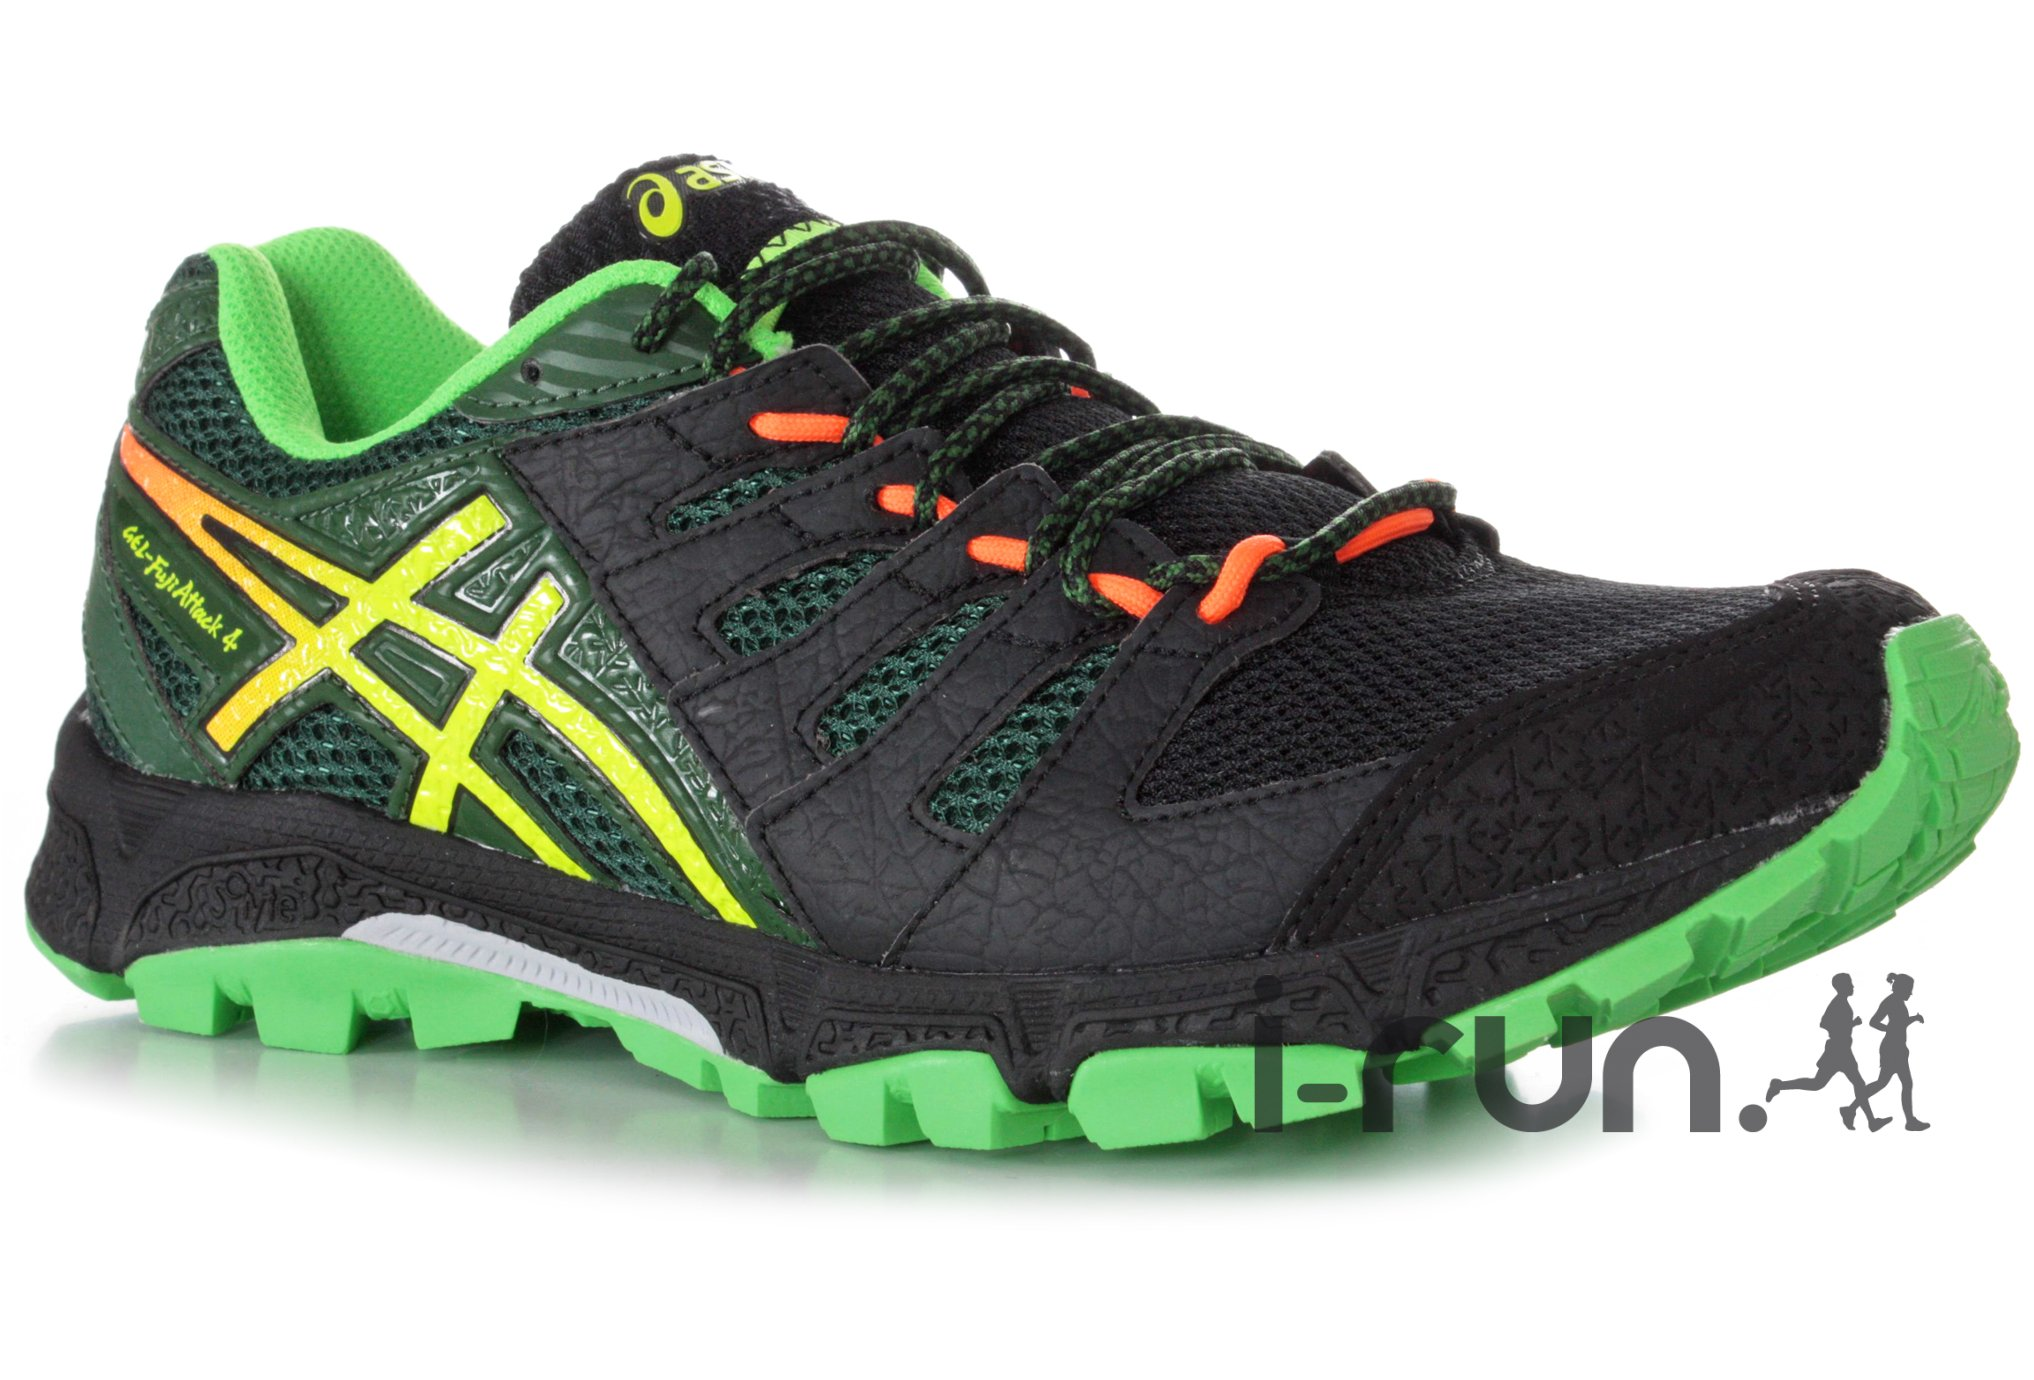 4n1vva 2 Presentiment At Chaussures Fuji Running Trail Attack Asics YgTfwq